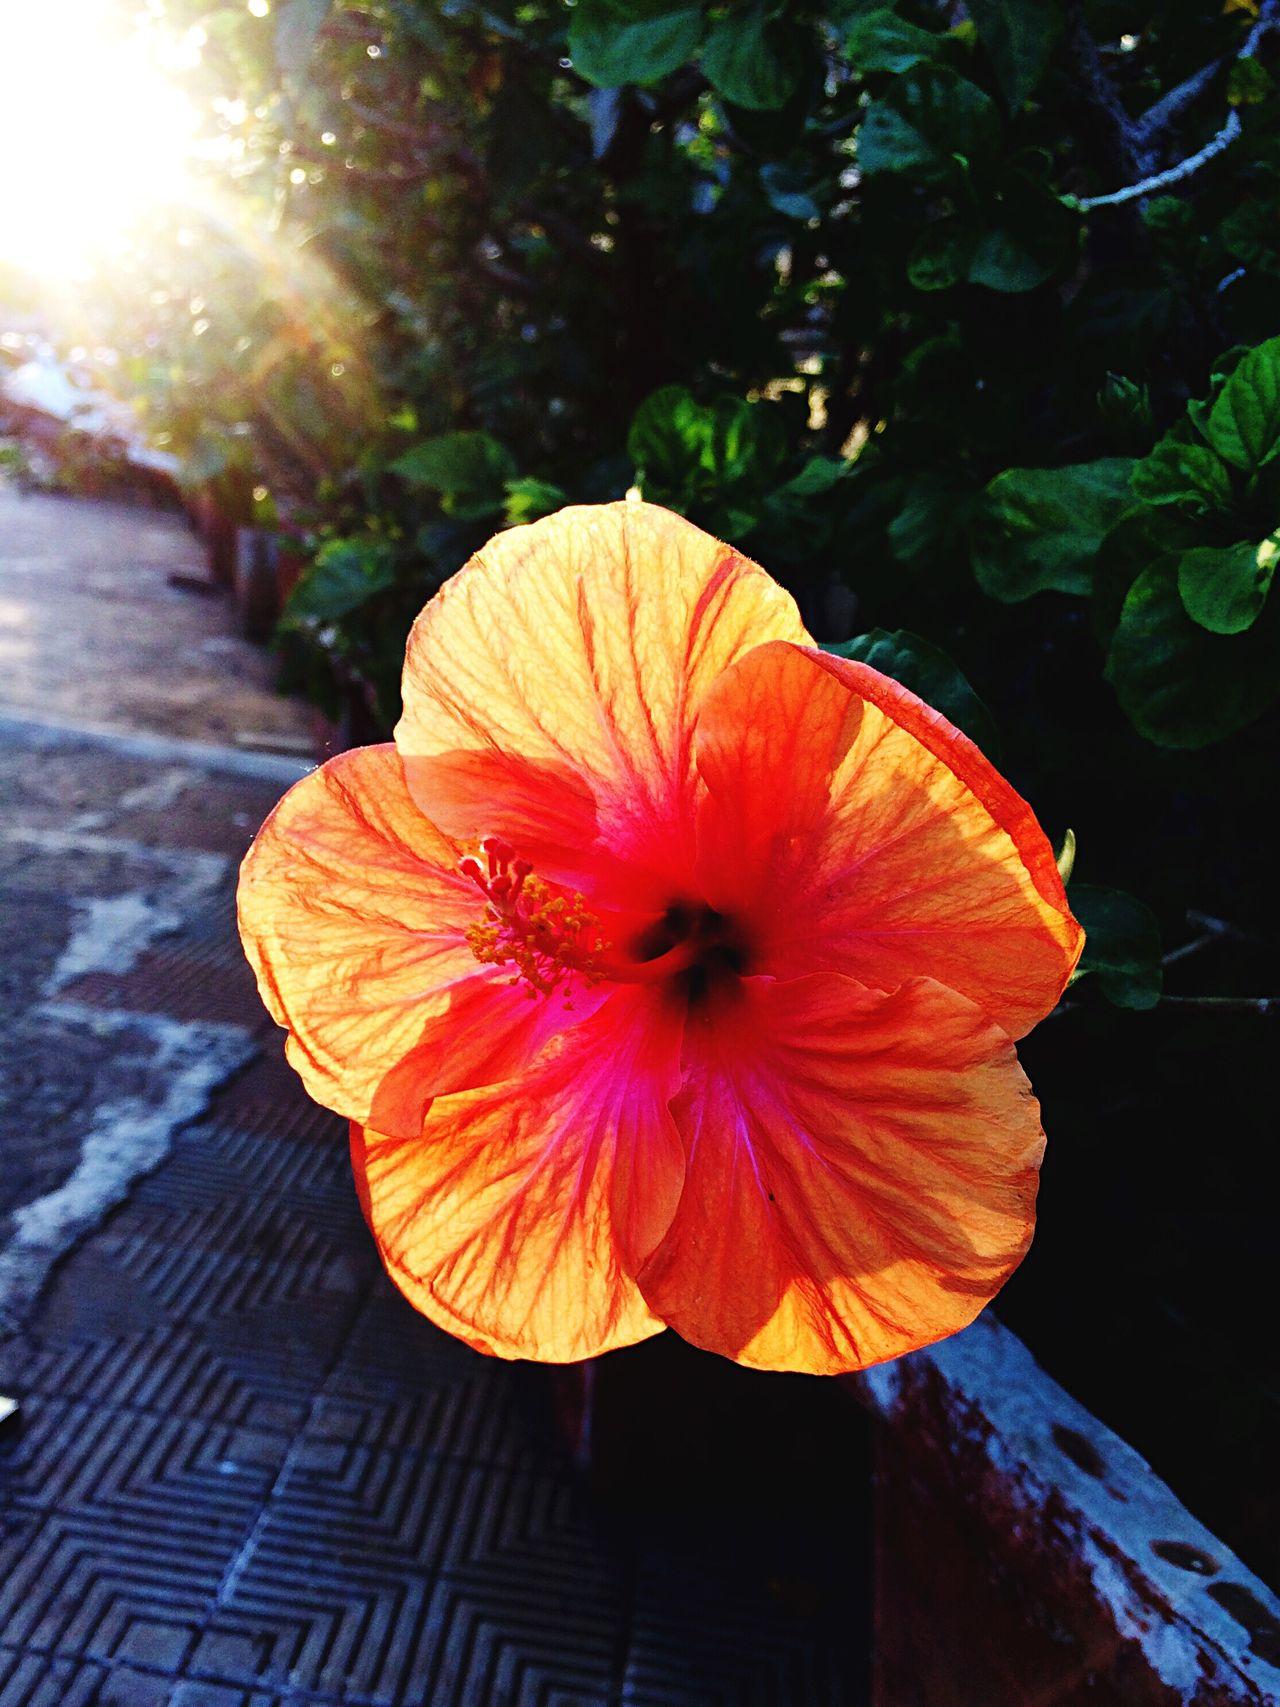 Hibiscus Flower Flower EyeEmFlower Flower Head EyeEm EyeEm Best Shots EyeEm Nature Lover Evening Light Flowers Nature Beauty In Nature Orange Color Blooming No People Eye4photography  Flowers, Nature And Beauty EyeEm Gallery EyeEmNewHere EyeEm Best Shots - Nature